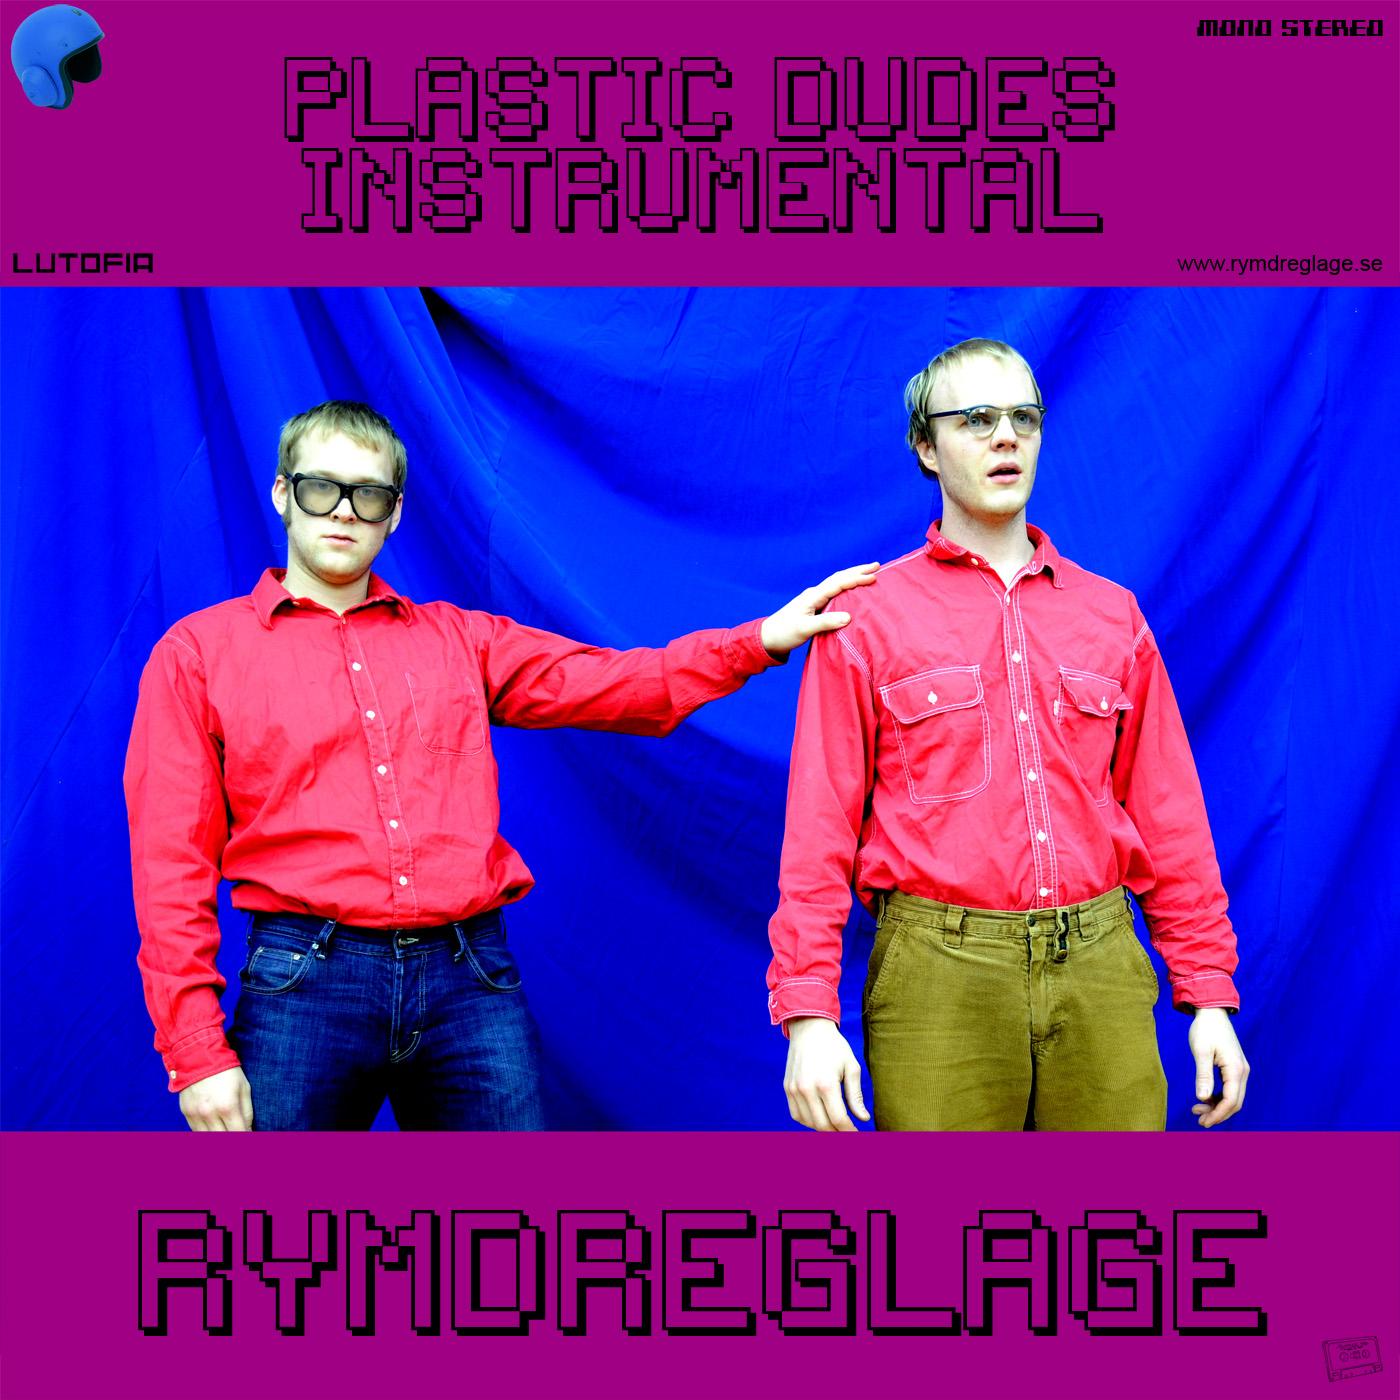 Plastic dudes_instrumental_to artspages